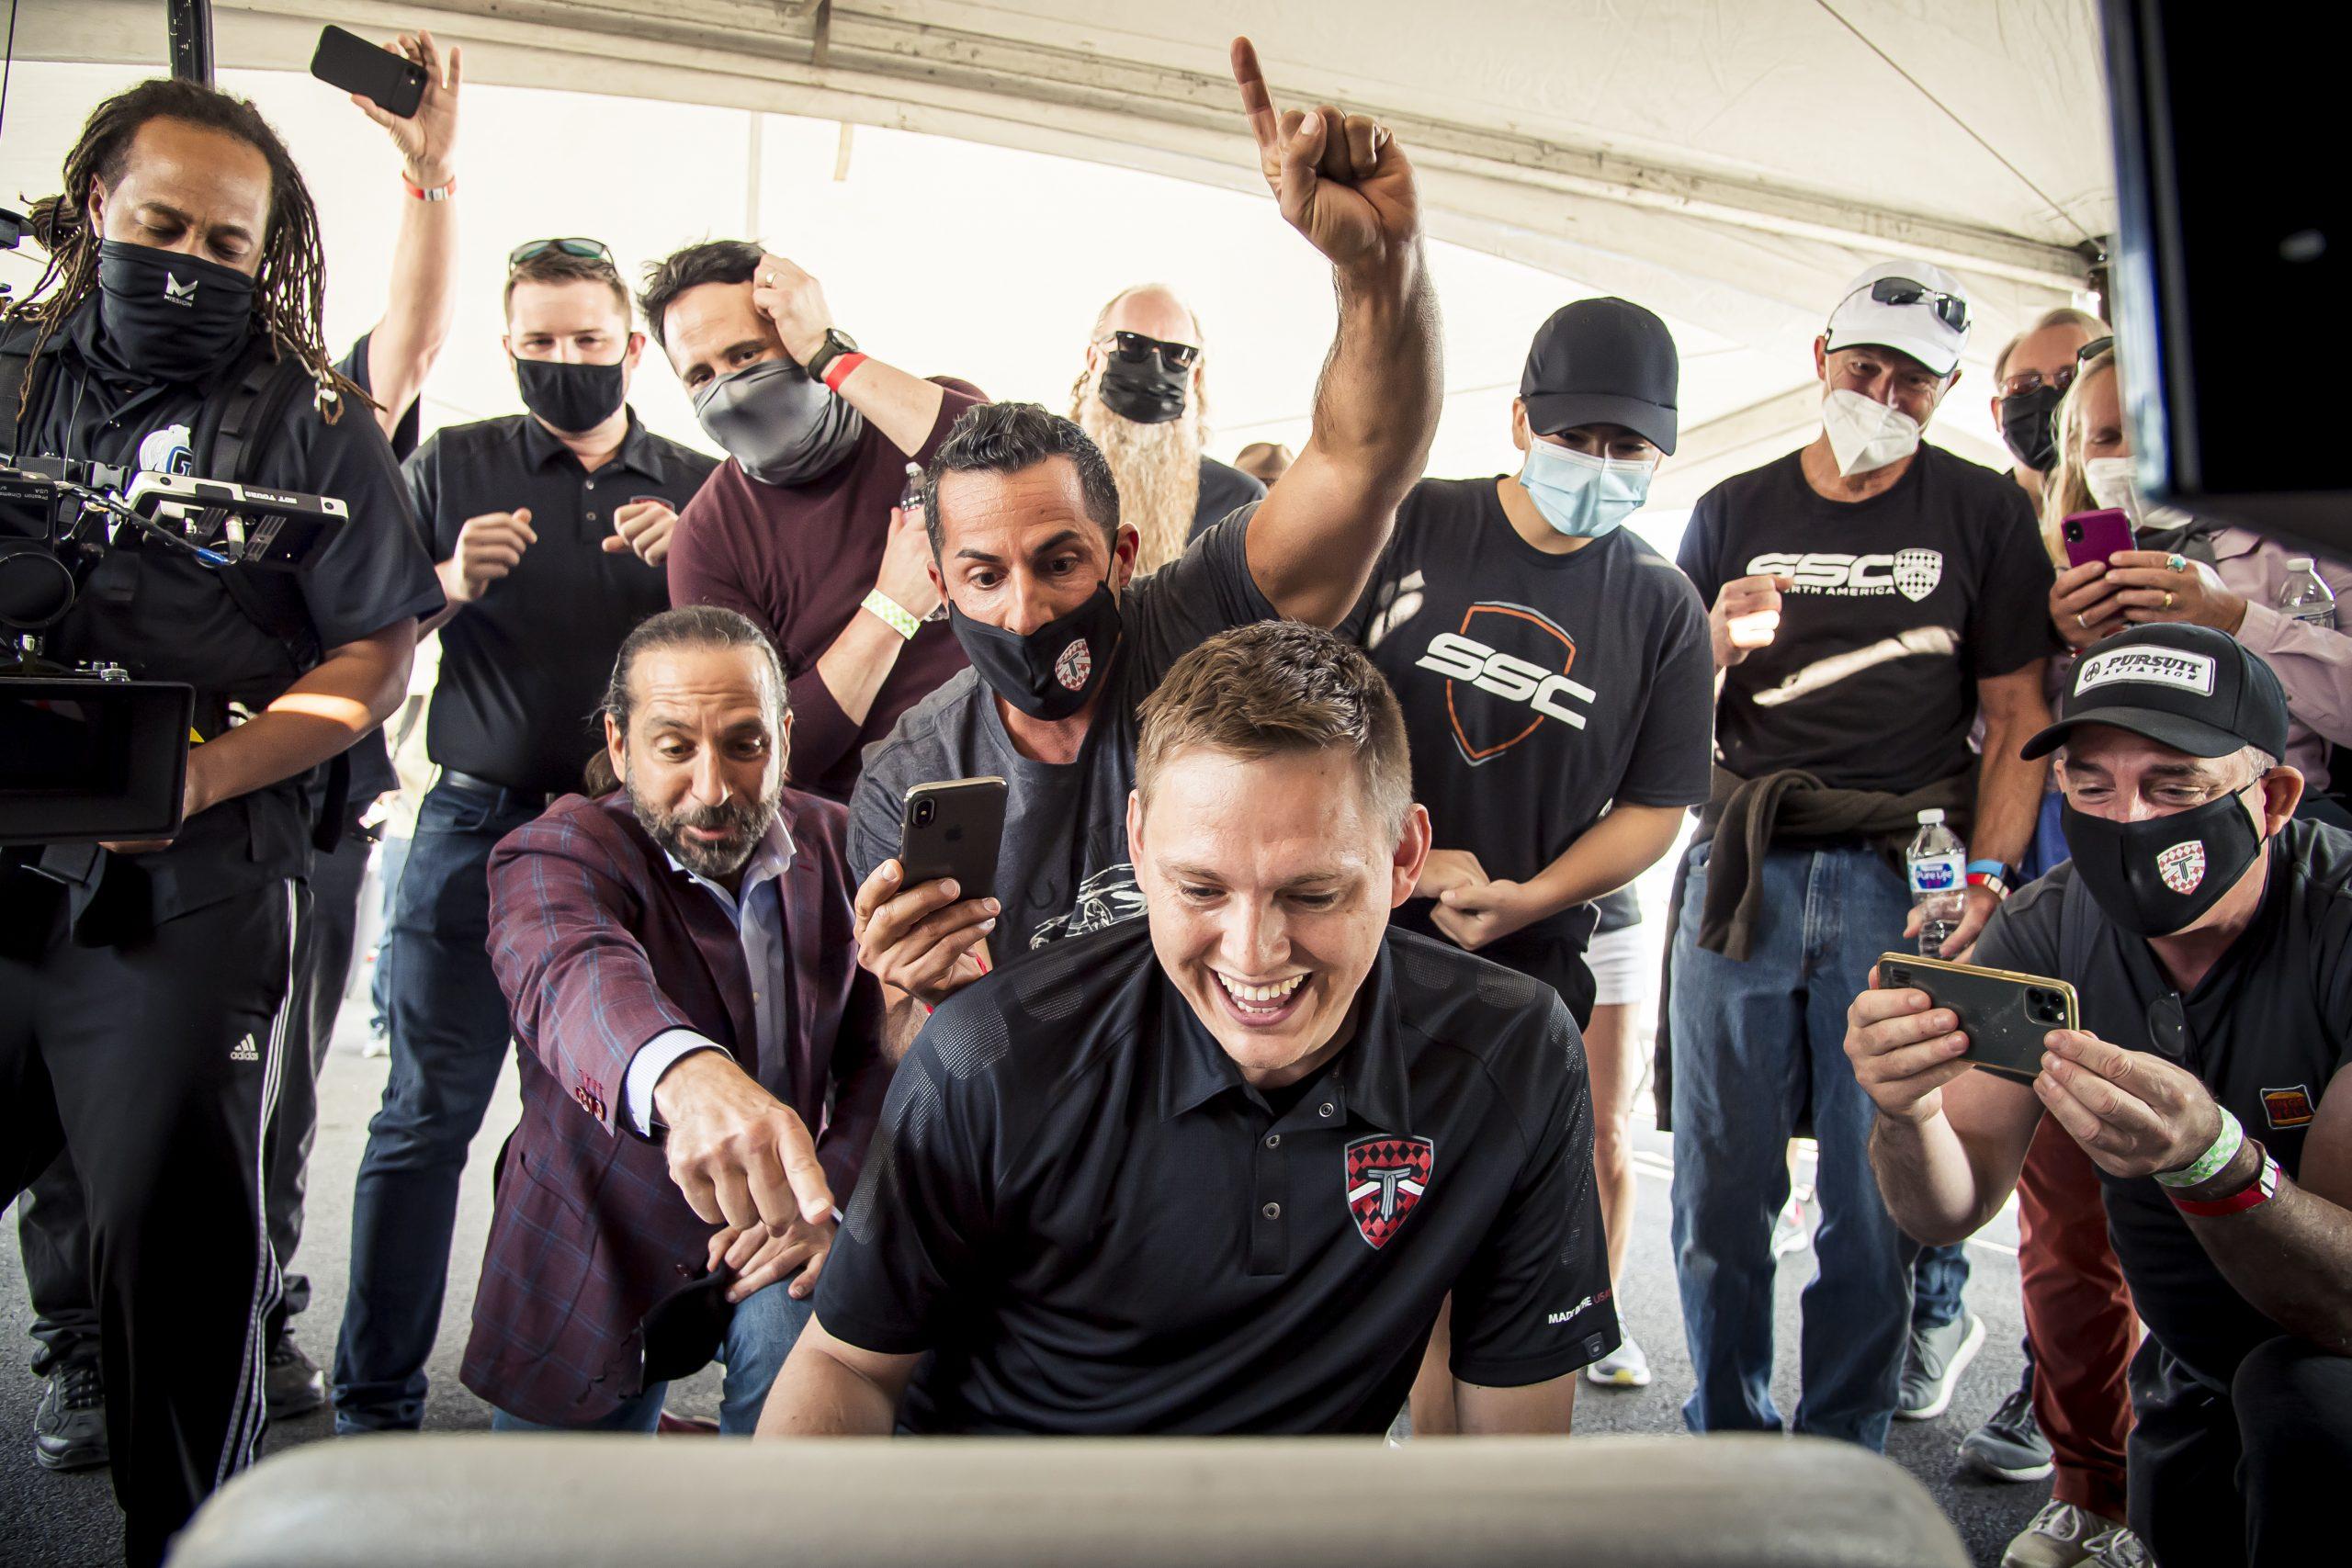 SSC Tuatara Production Car Speed Record team reaction